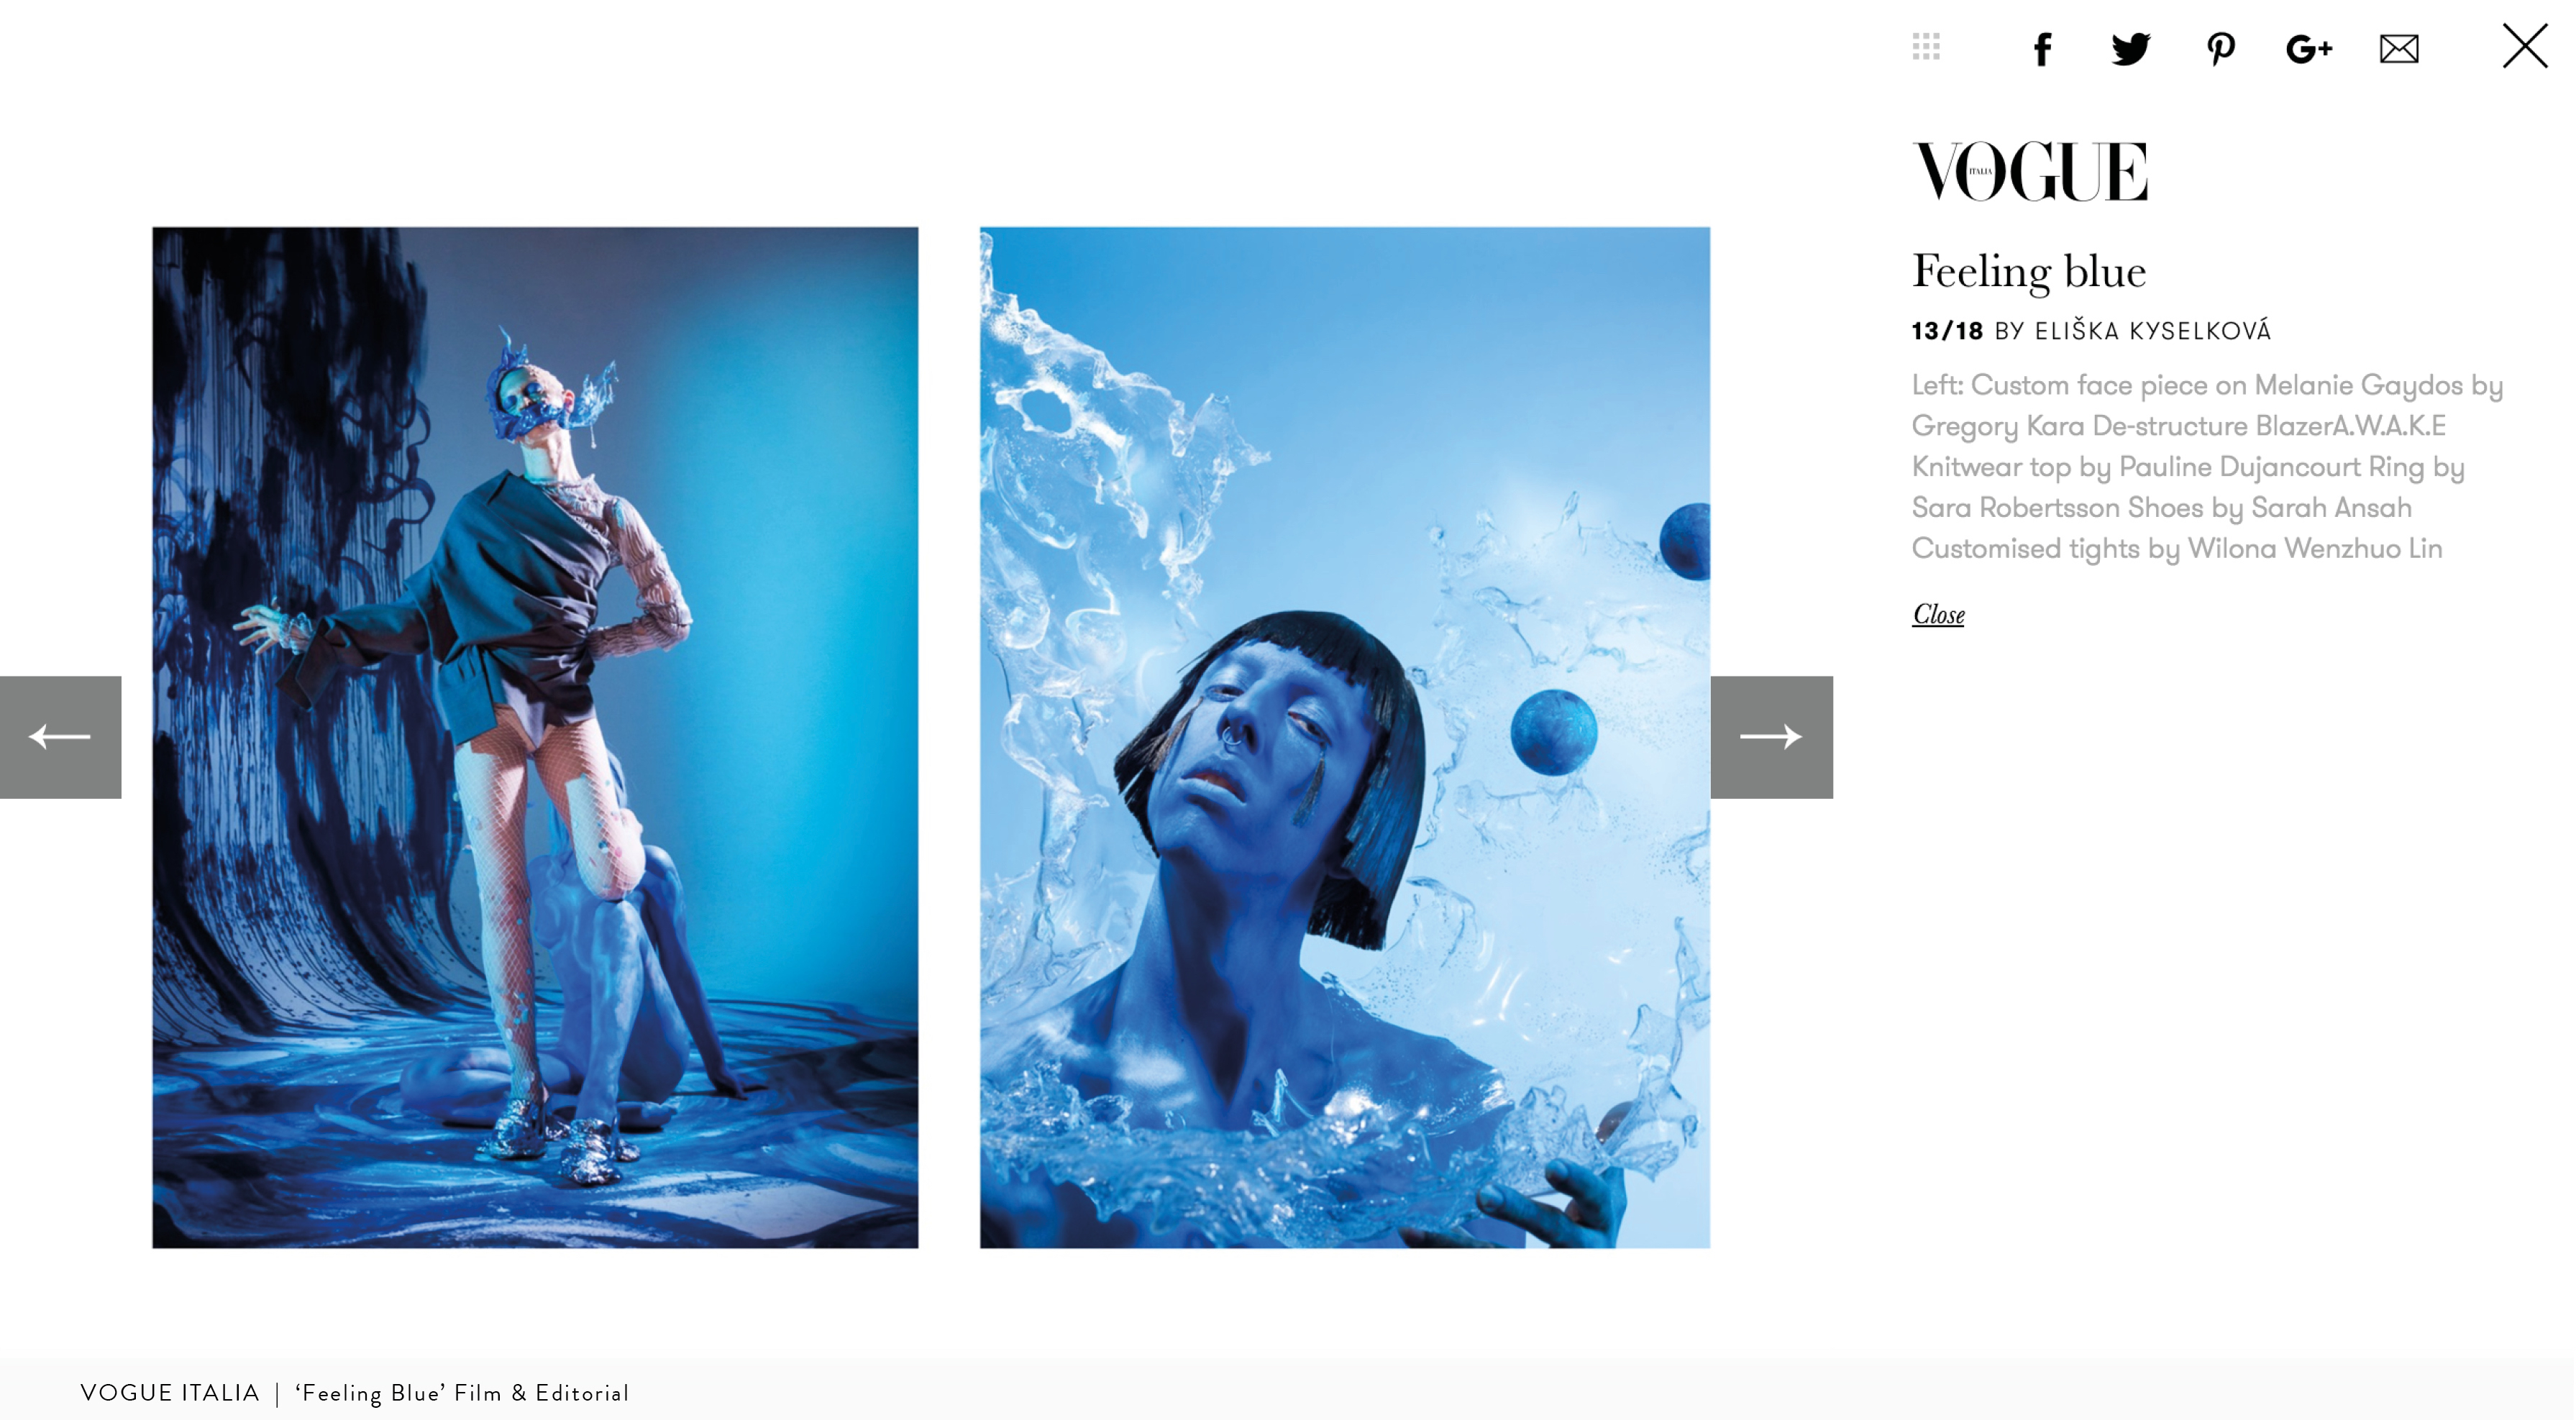 Vogue Italia | 'Feeling Blue' Film